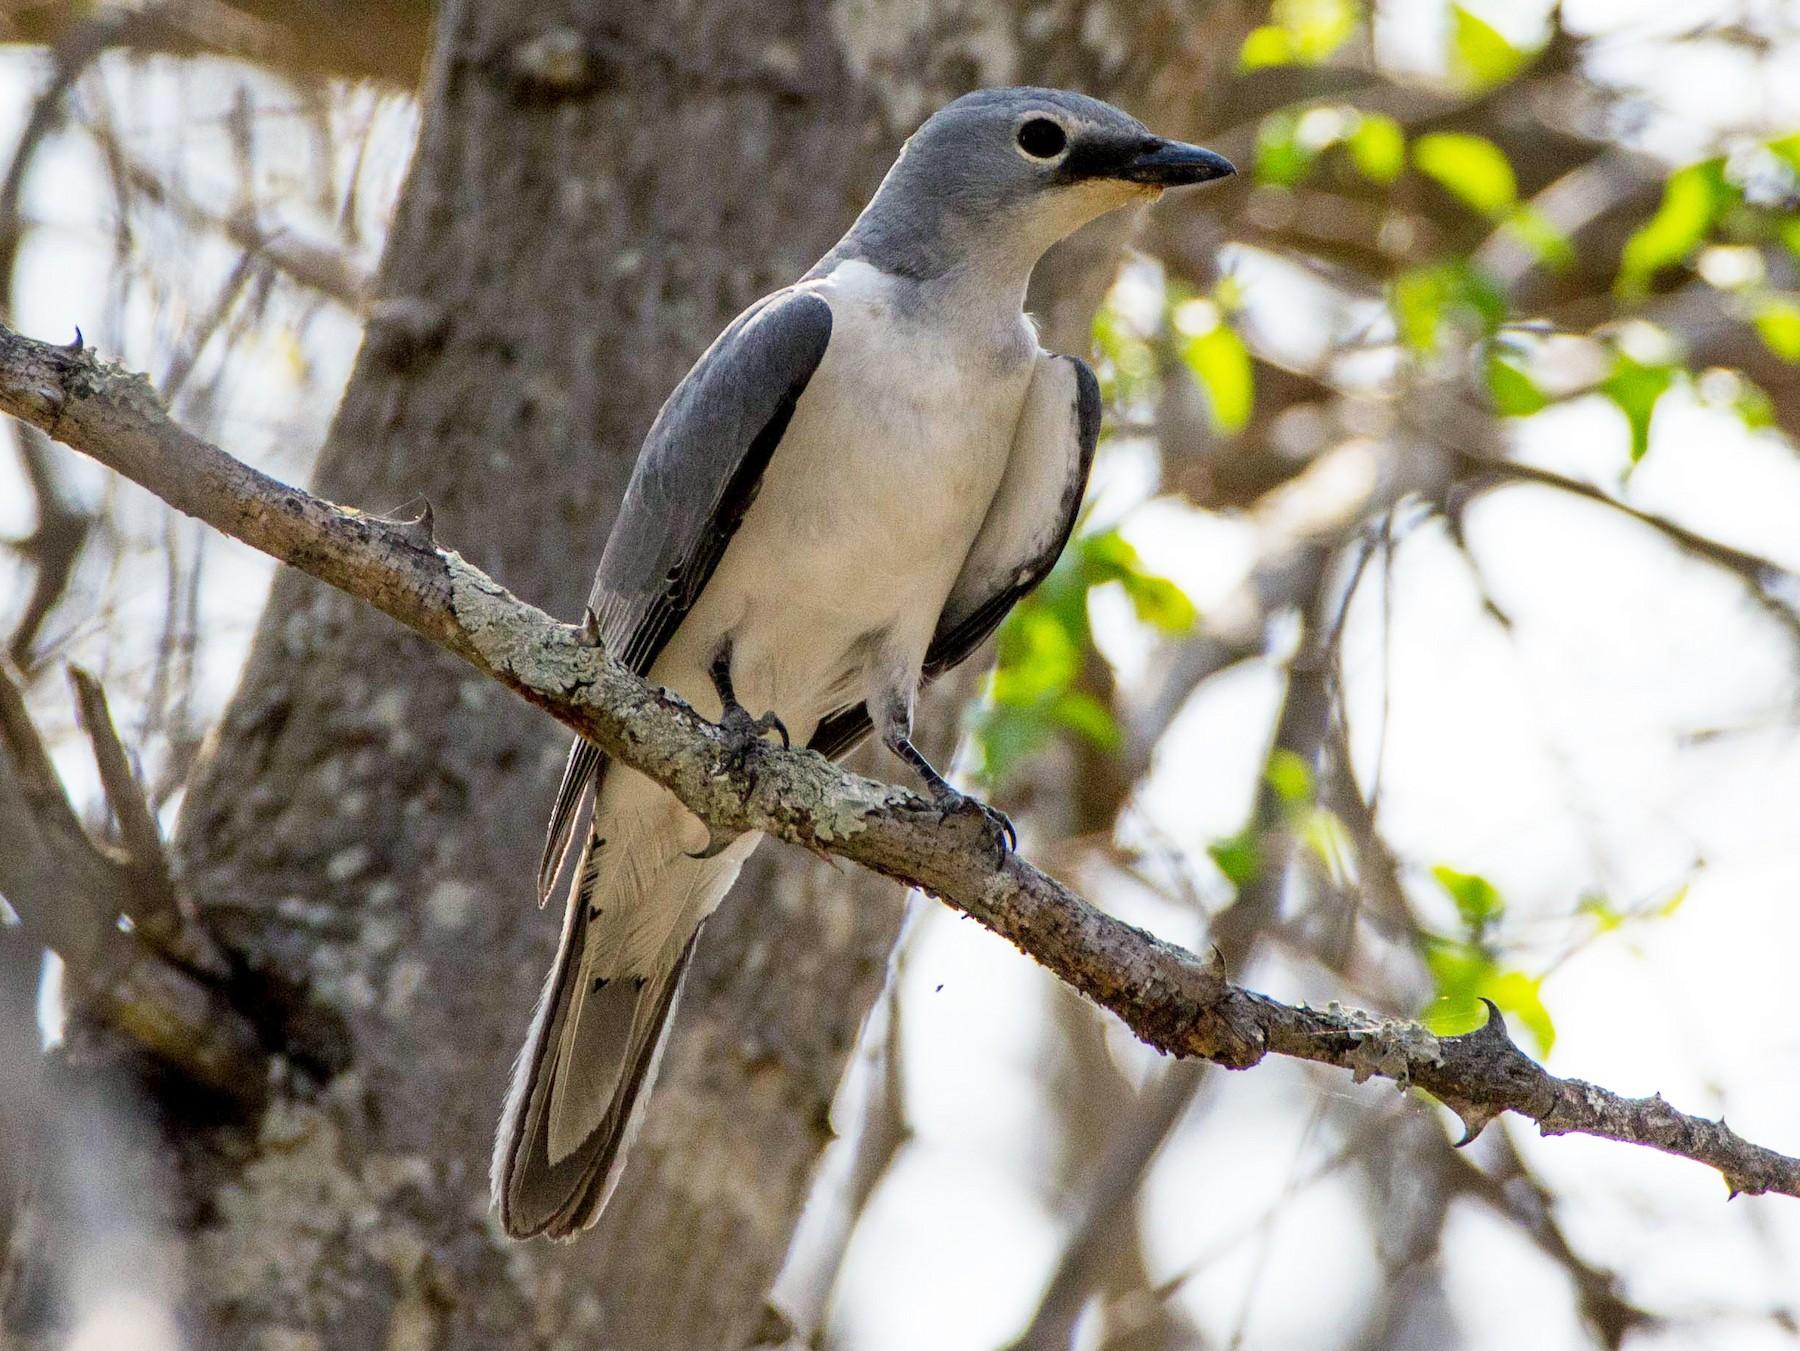 White-breasted Cuckooshrike - Angus Fitton